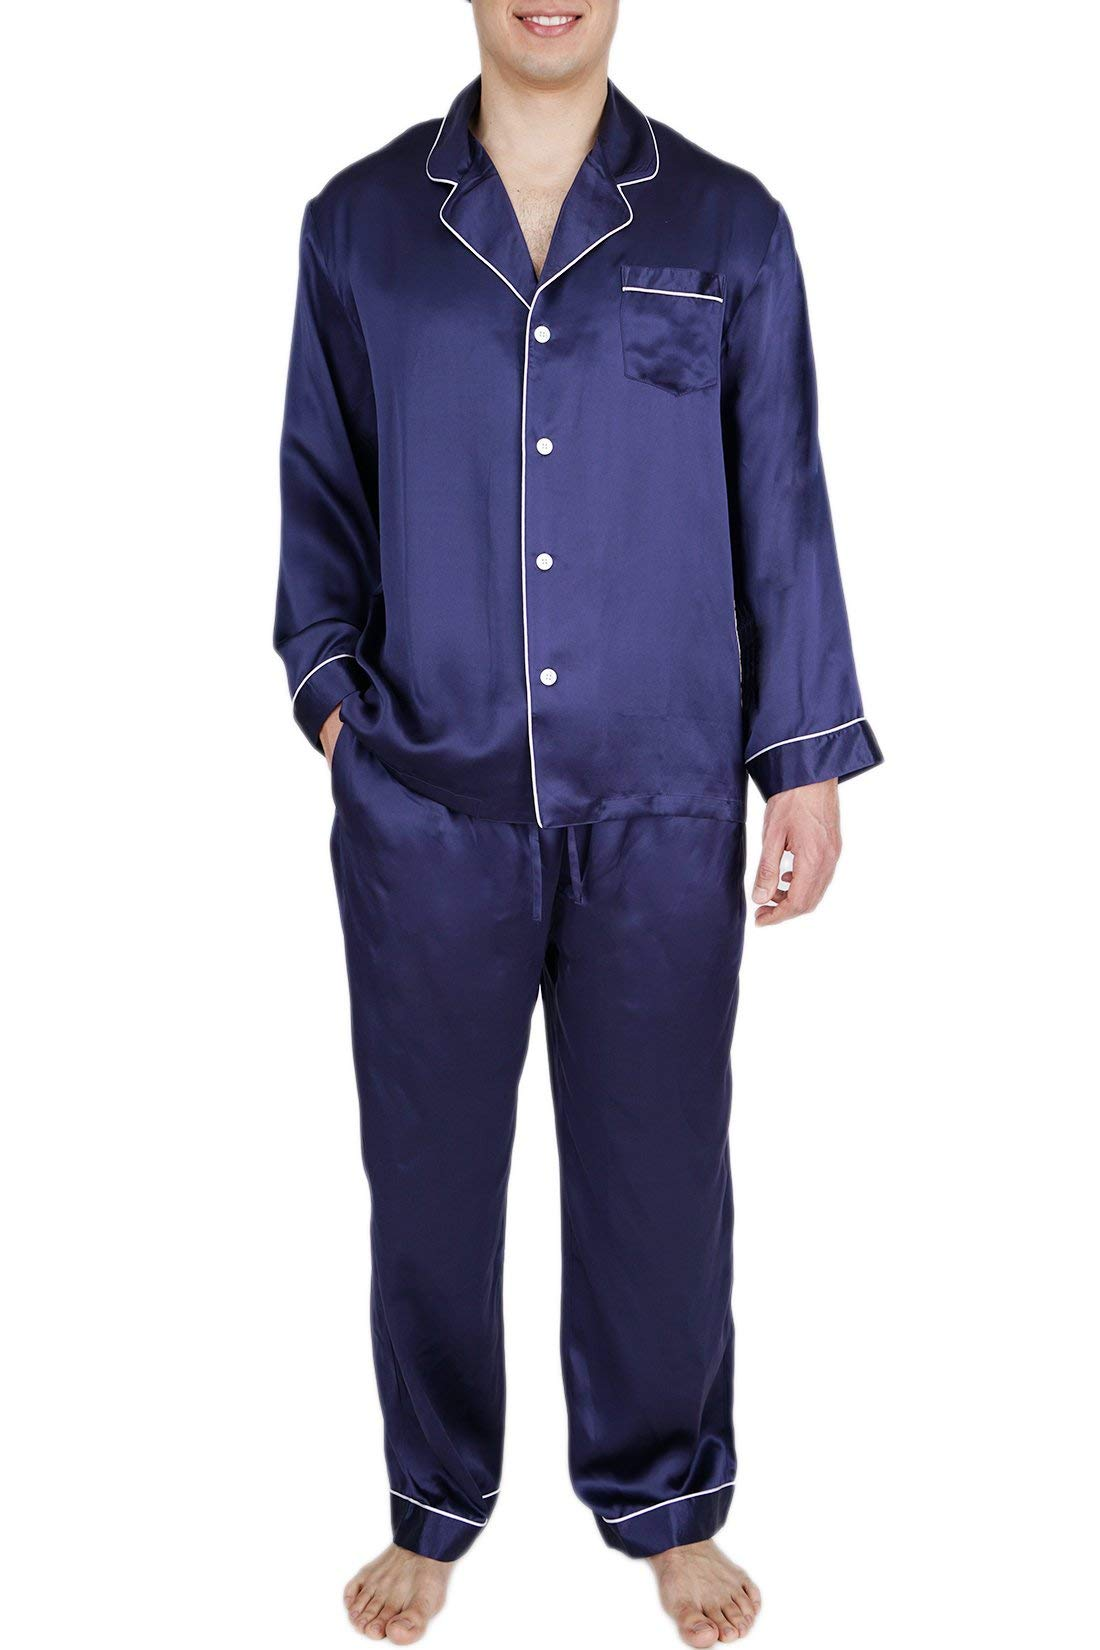 OSCAR ROSSA Men's Luxury Silk Sleepwear 100% Silk Pajamas Set Midnight Blue